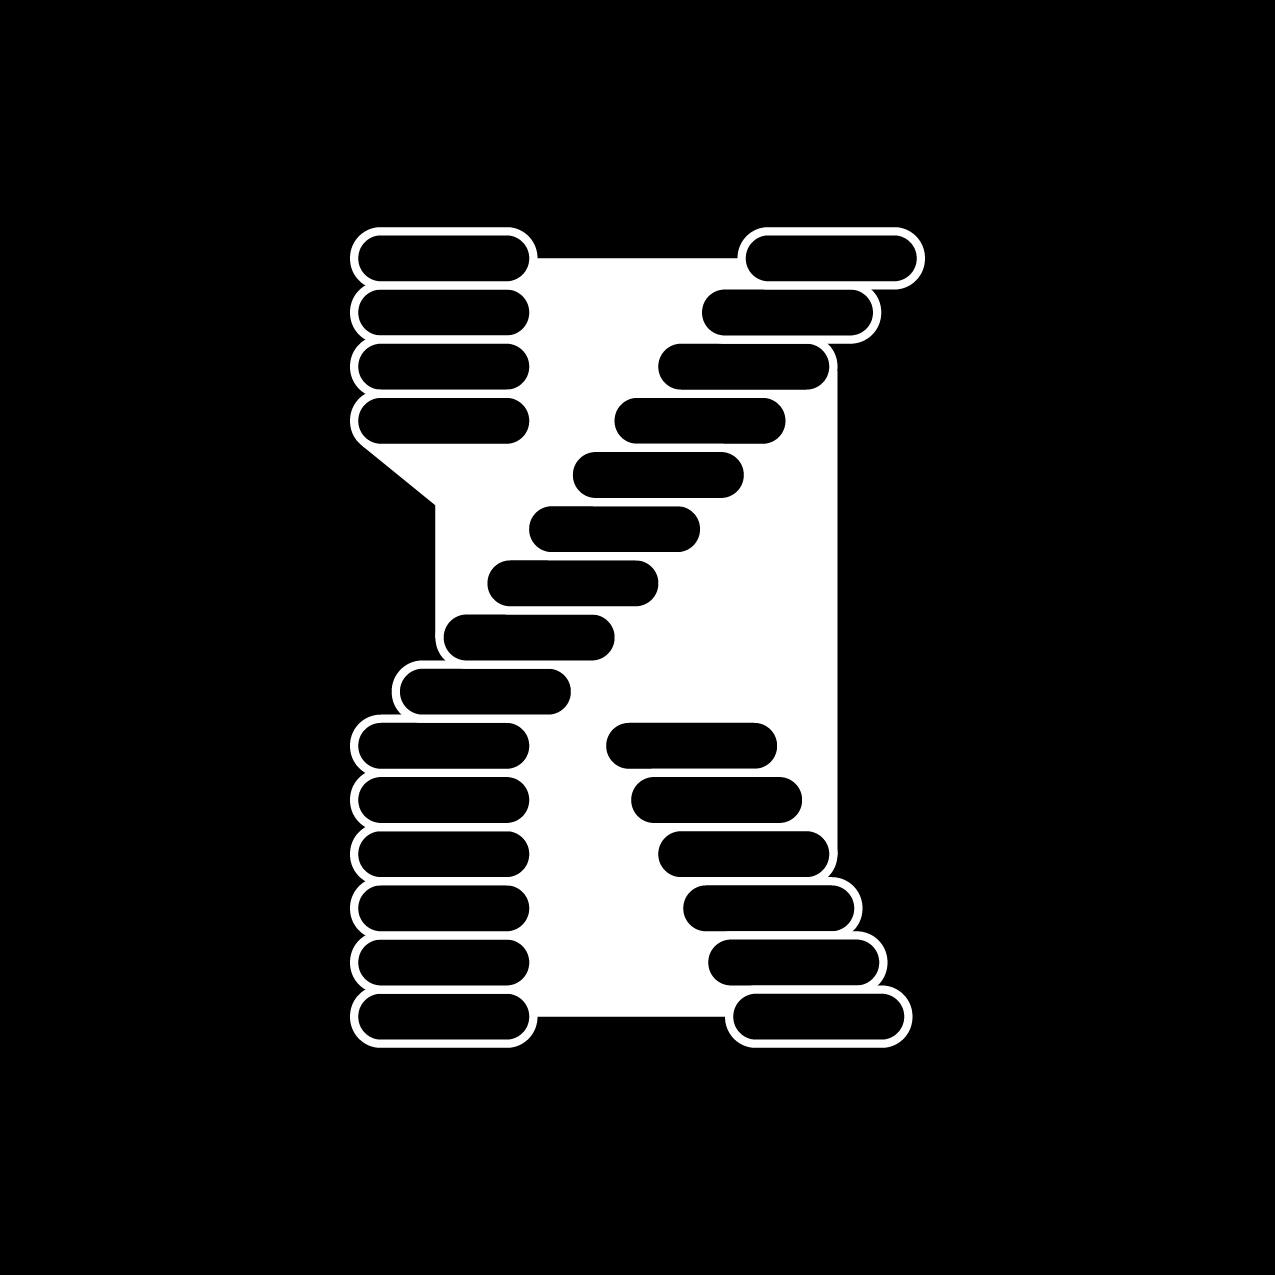 Letter K6 Design by Furia